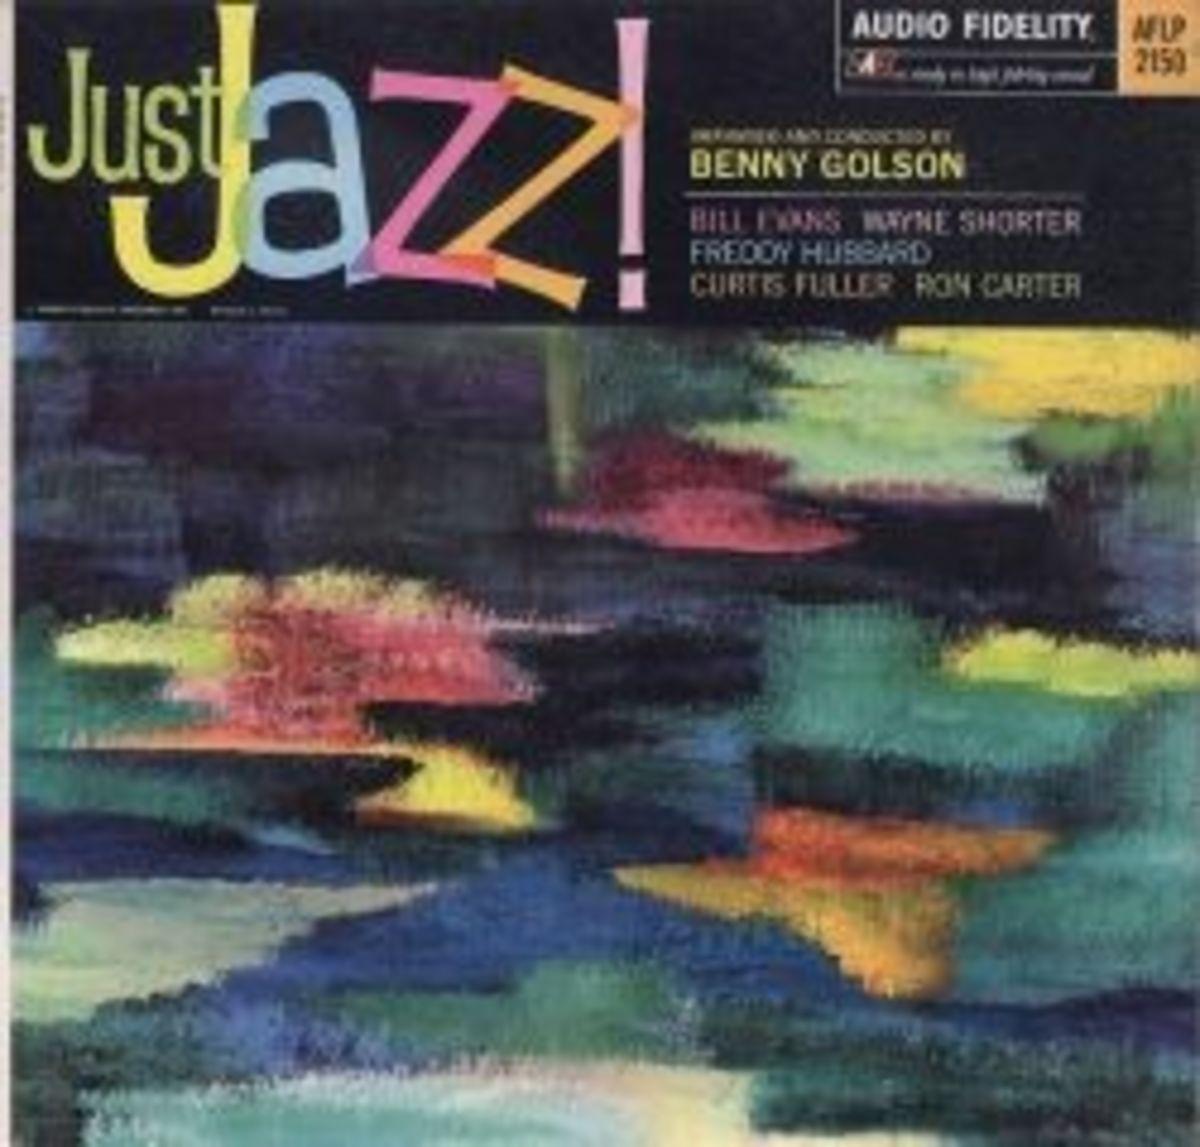 "Benny Goldon ""Just Jazz"" Audio Fidelity Records AFLP 2150 LP Vinyl Record"